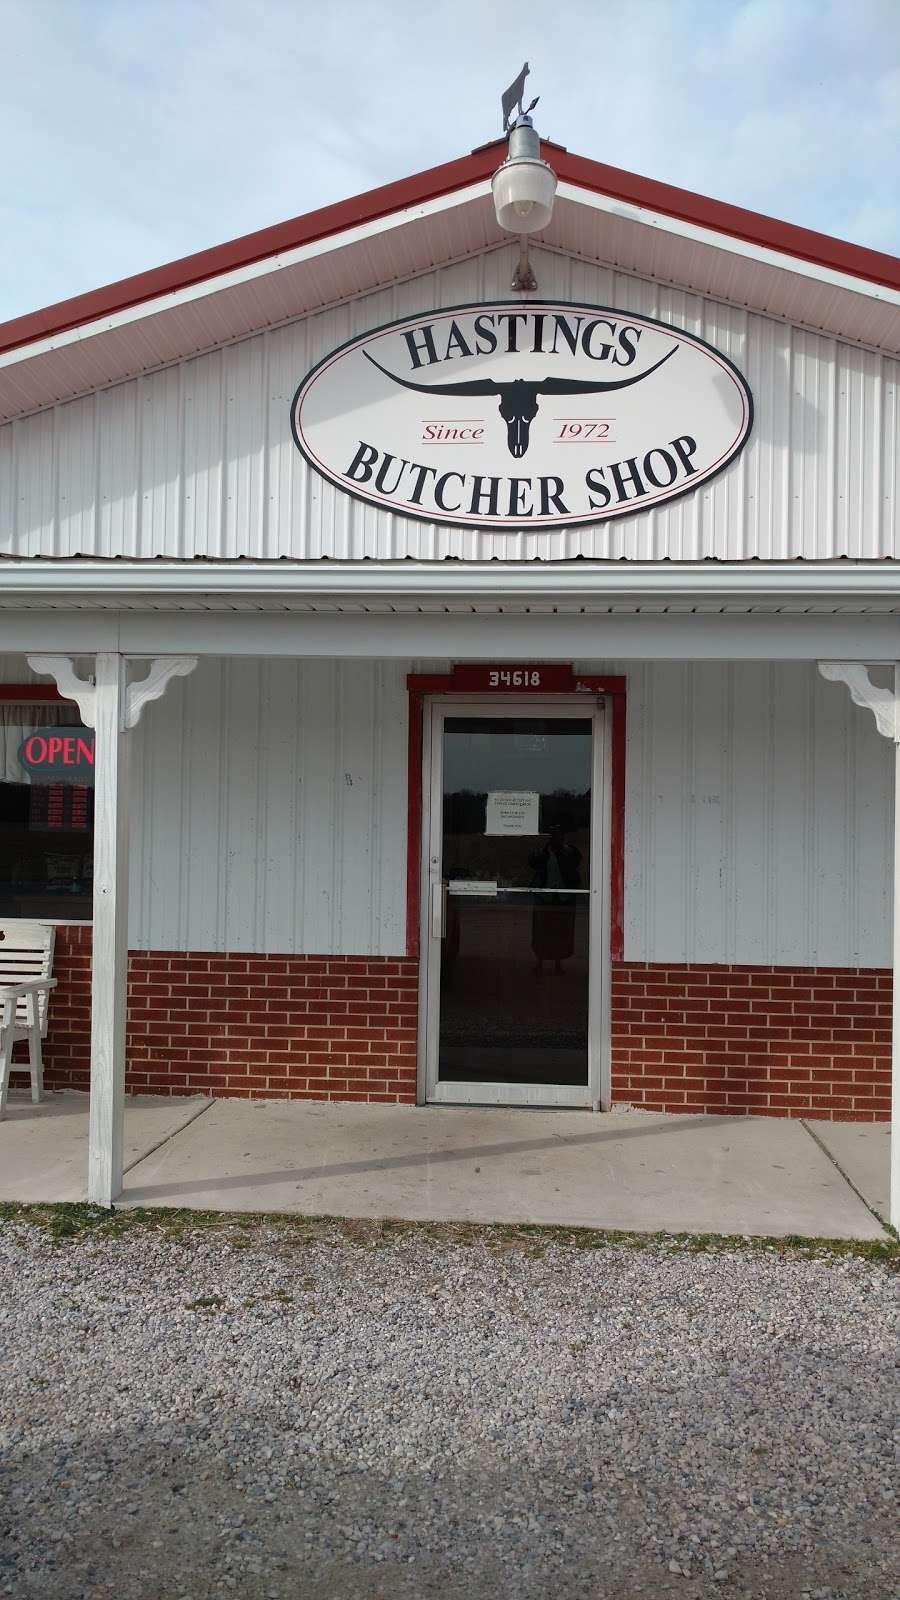 Hastings Butcher Shop - store    Photo 1 of 1   Address: 34618 Rd 510, Laurel, DE 19956, USA   Phone: (302) 875-7431